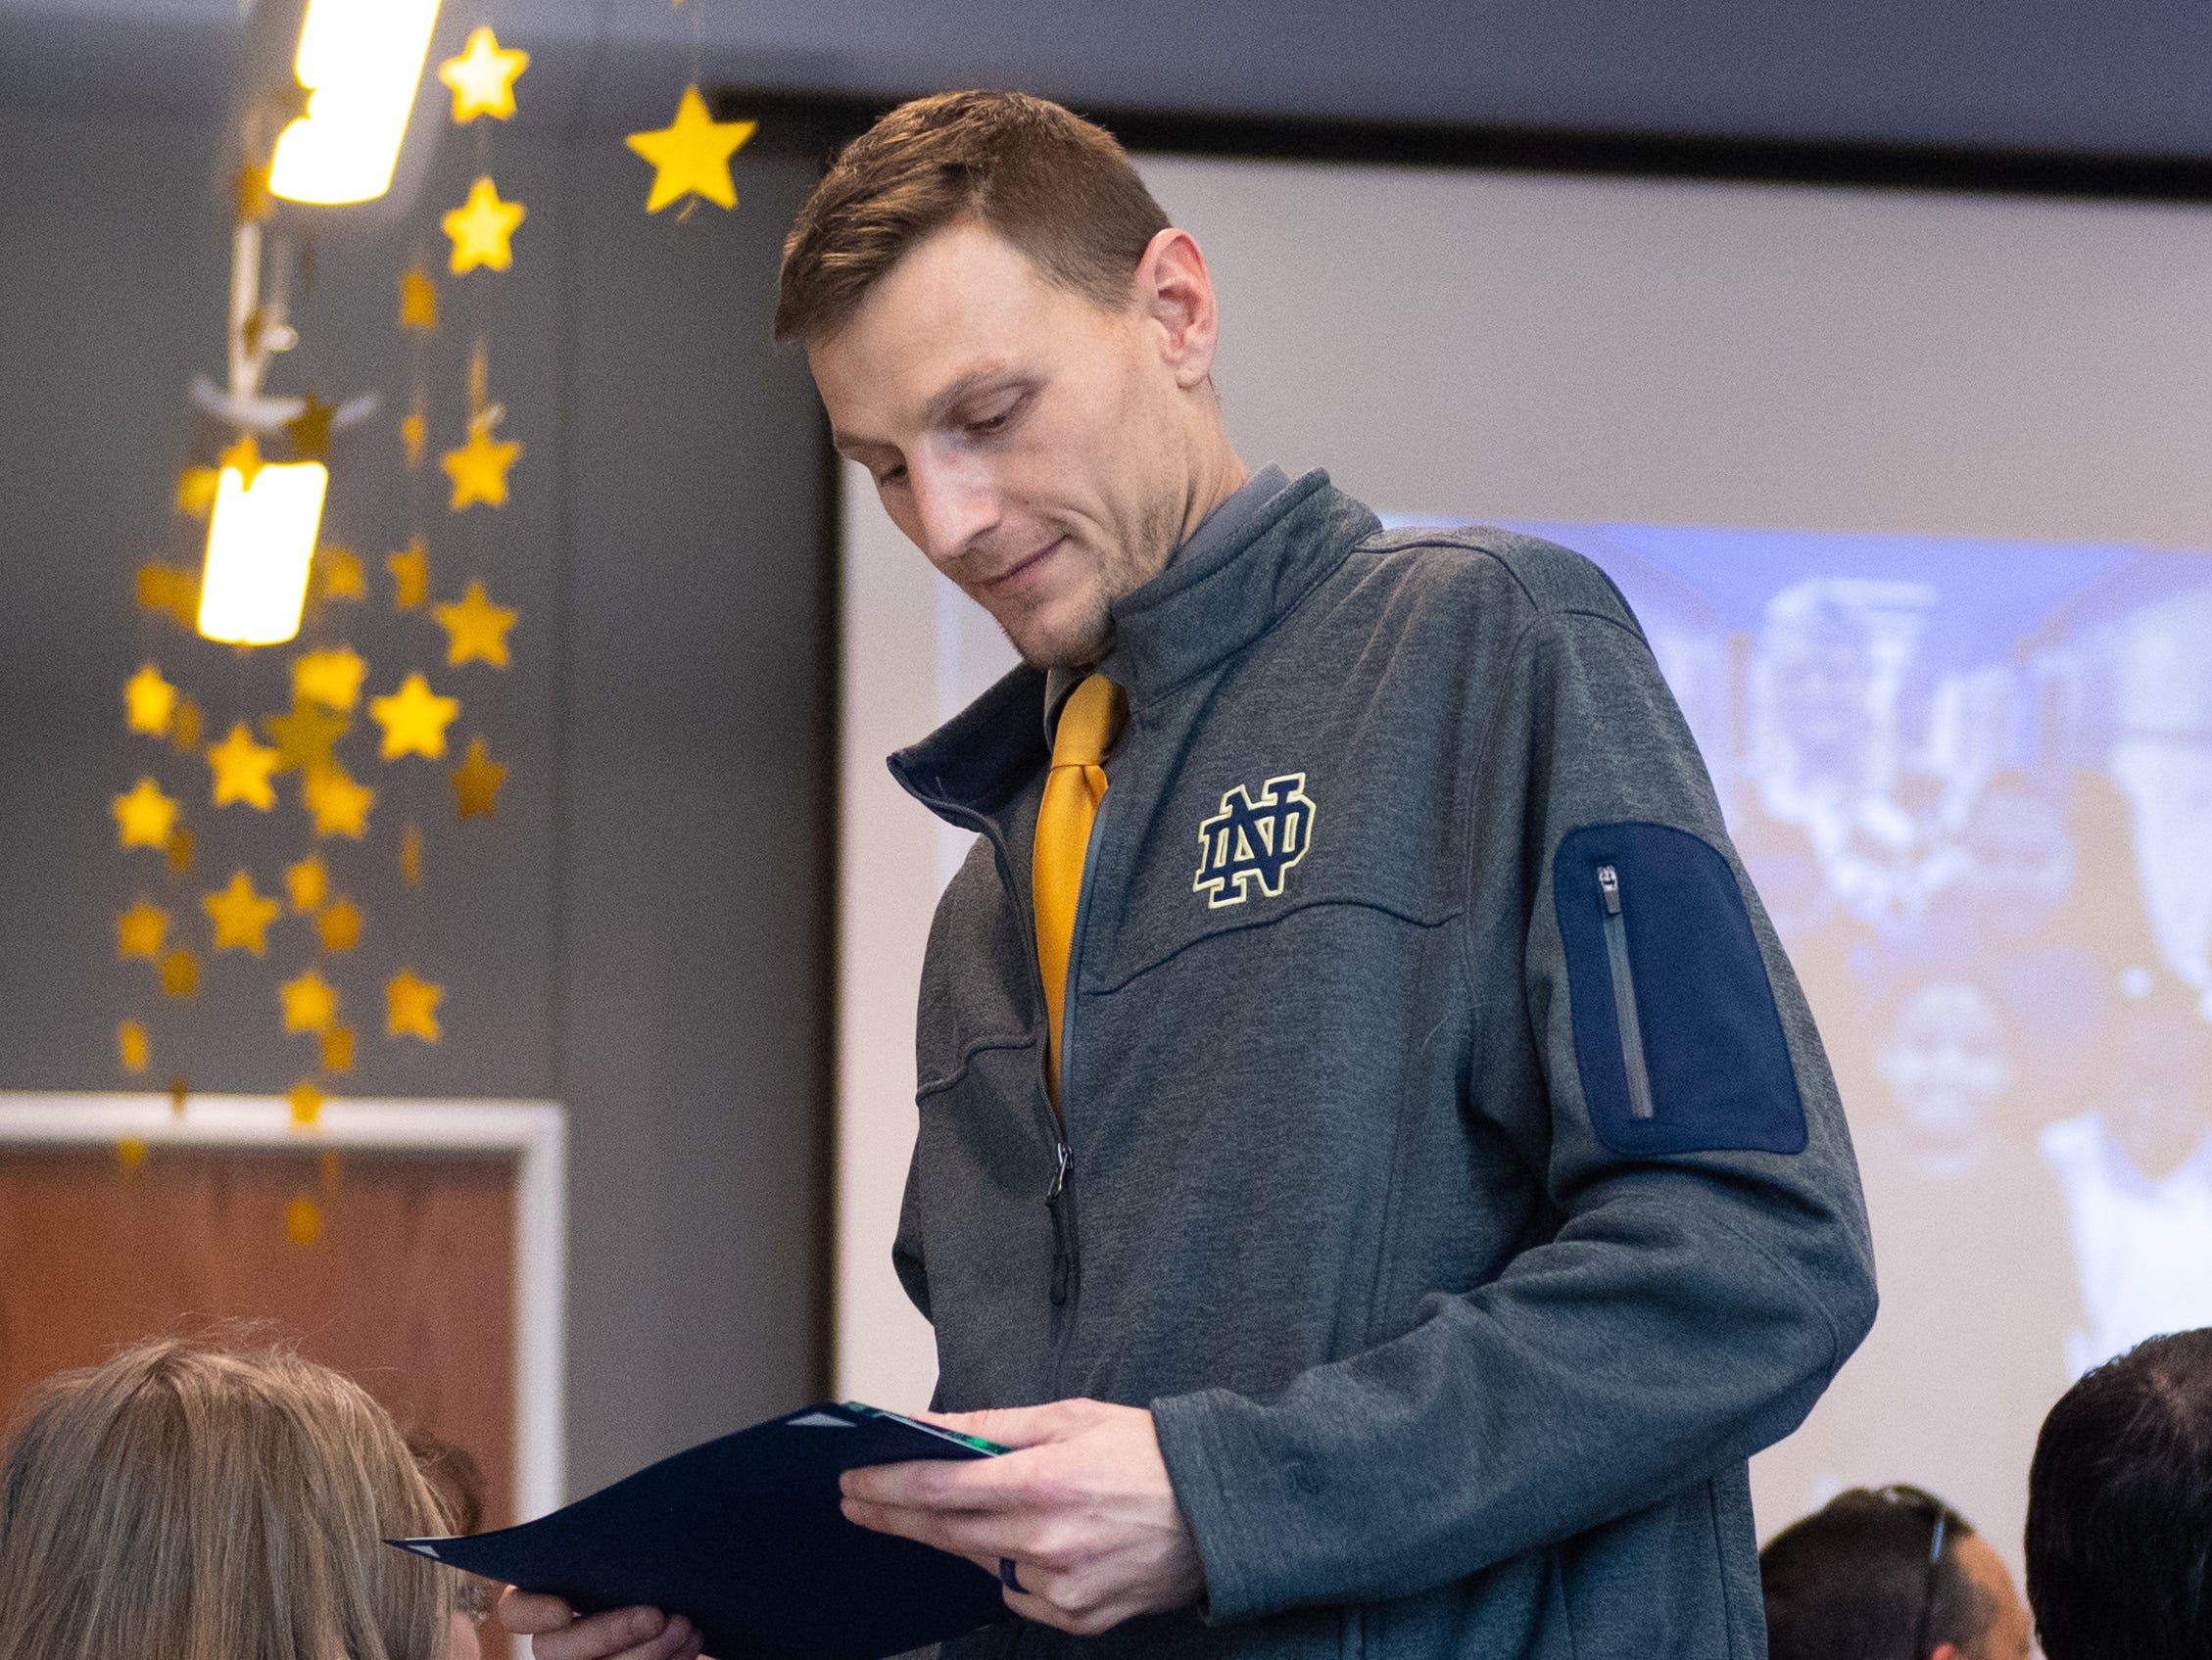 Nathaniel Leierer checks out his Shining Star award for his teaching at Davis, December 6, 2018.